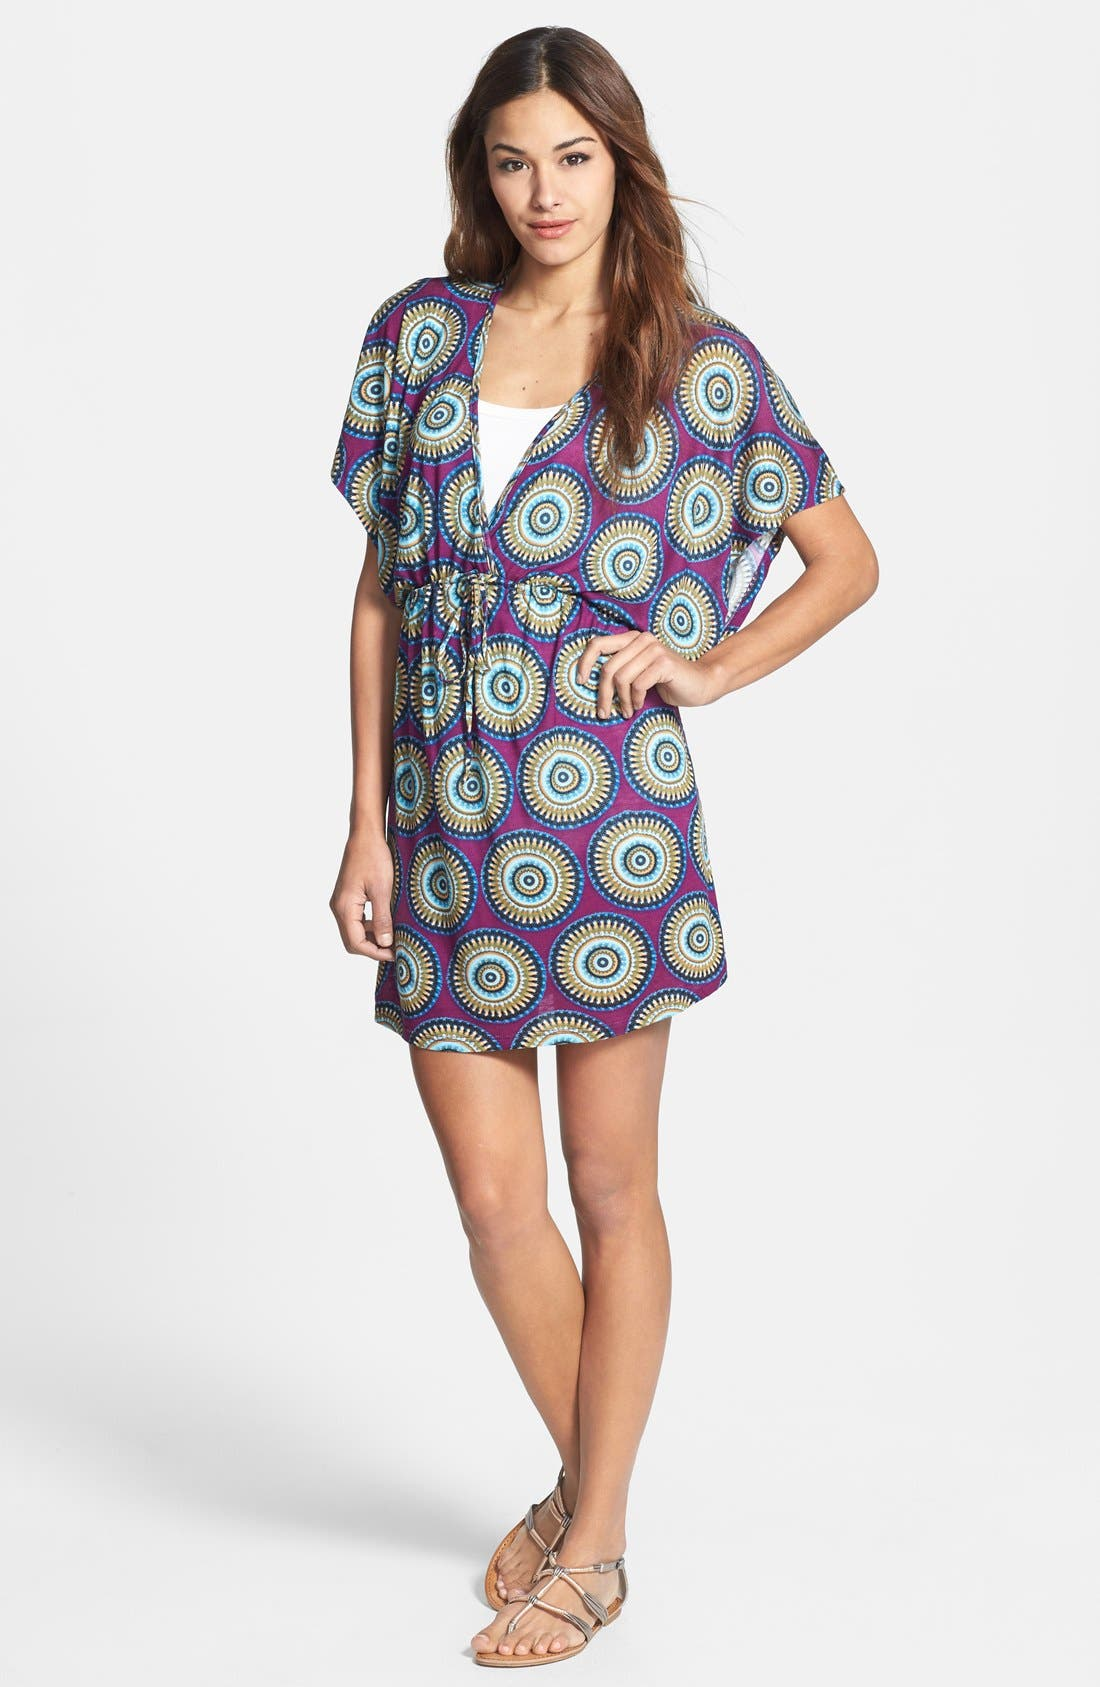 Main Image - Loveappella Print Kimono Style Dress